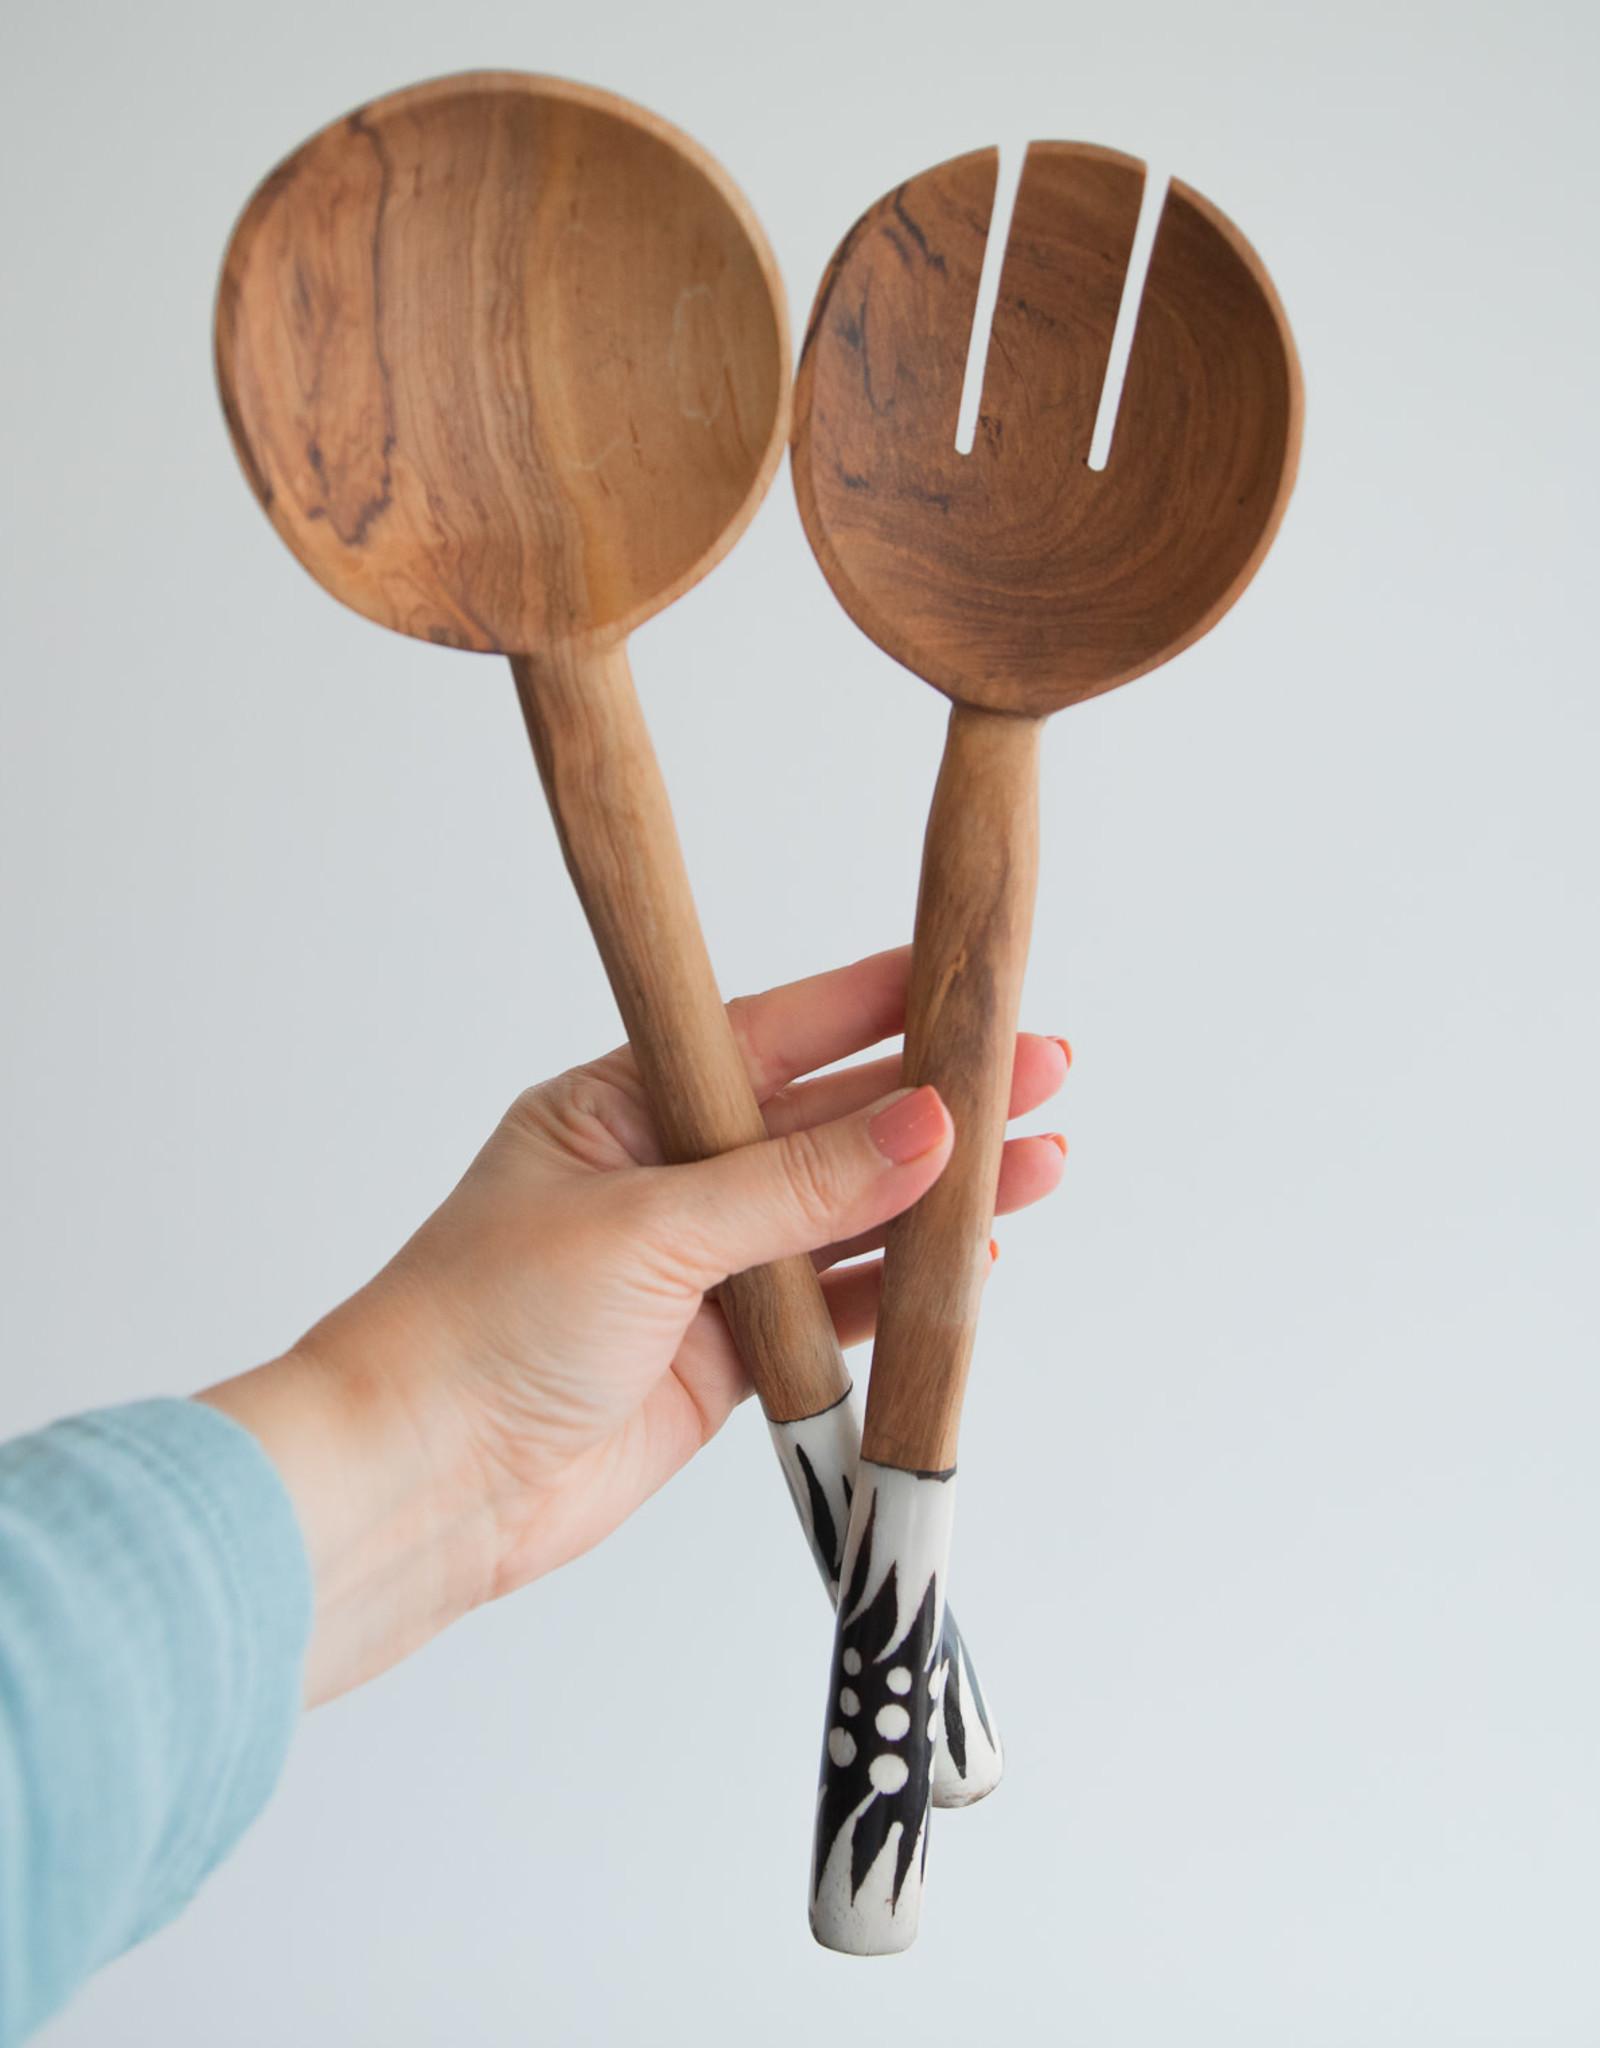 Olive Wood Serving Spoons - Set of 2